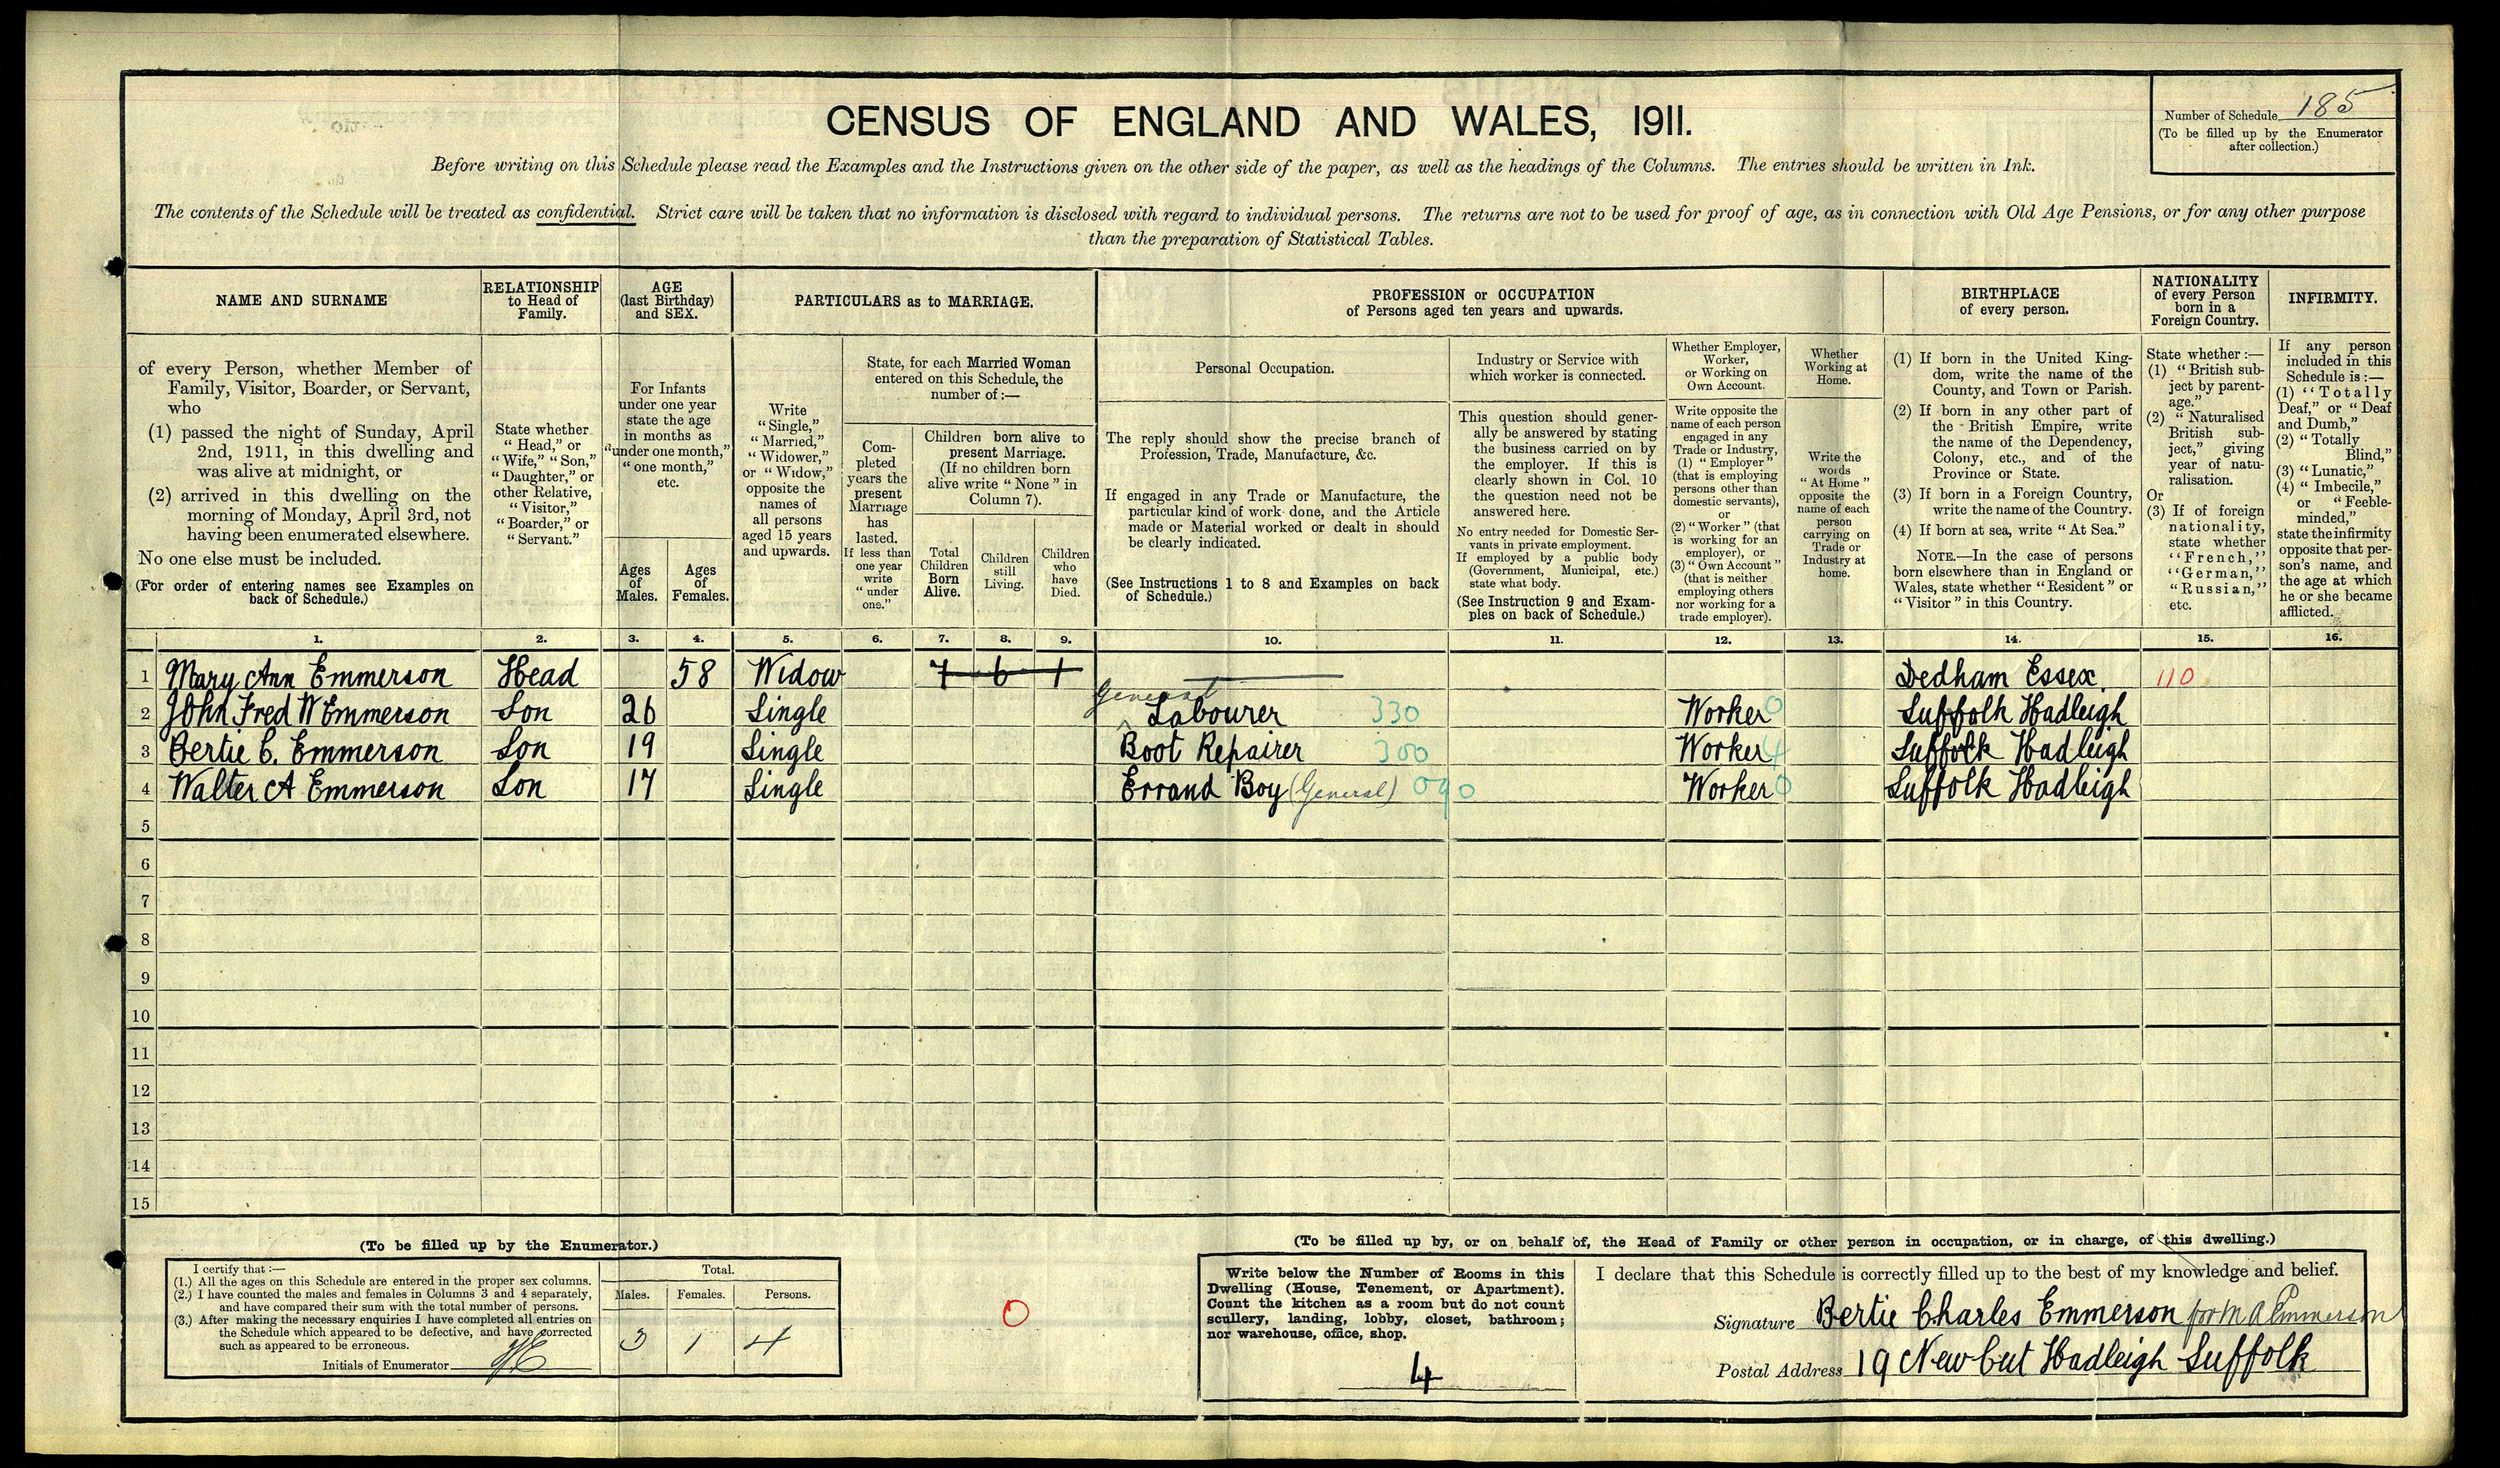 BCE 1911 census.jpg